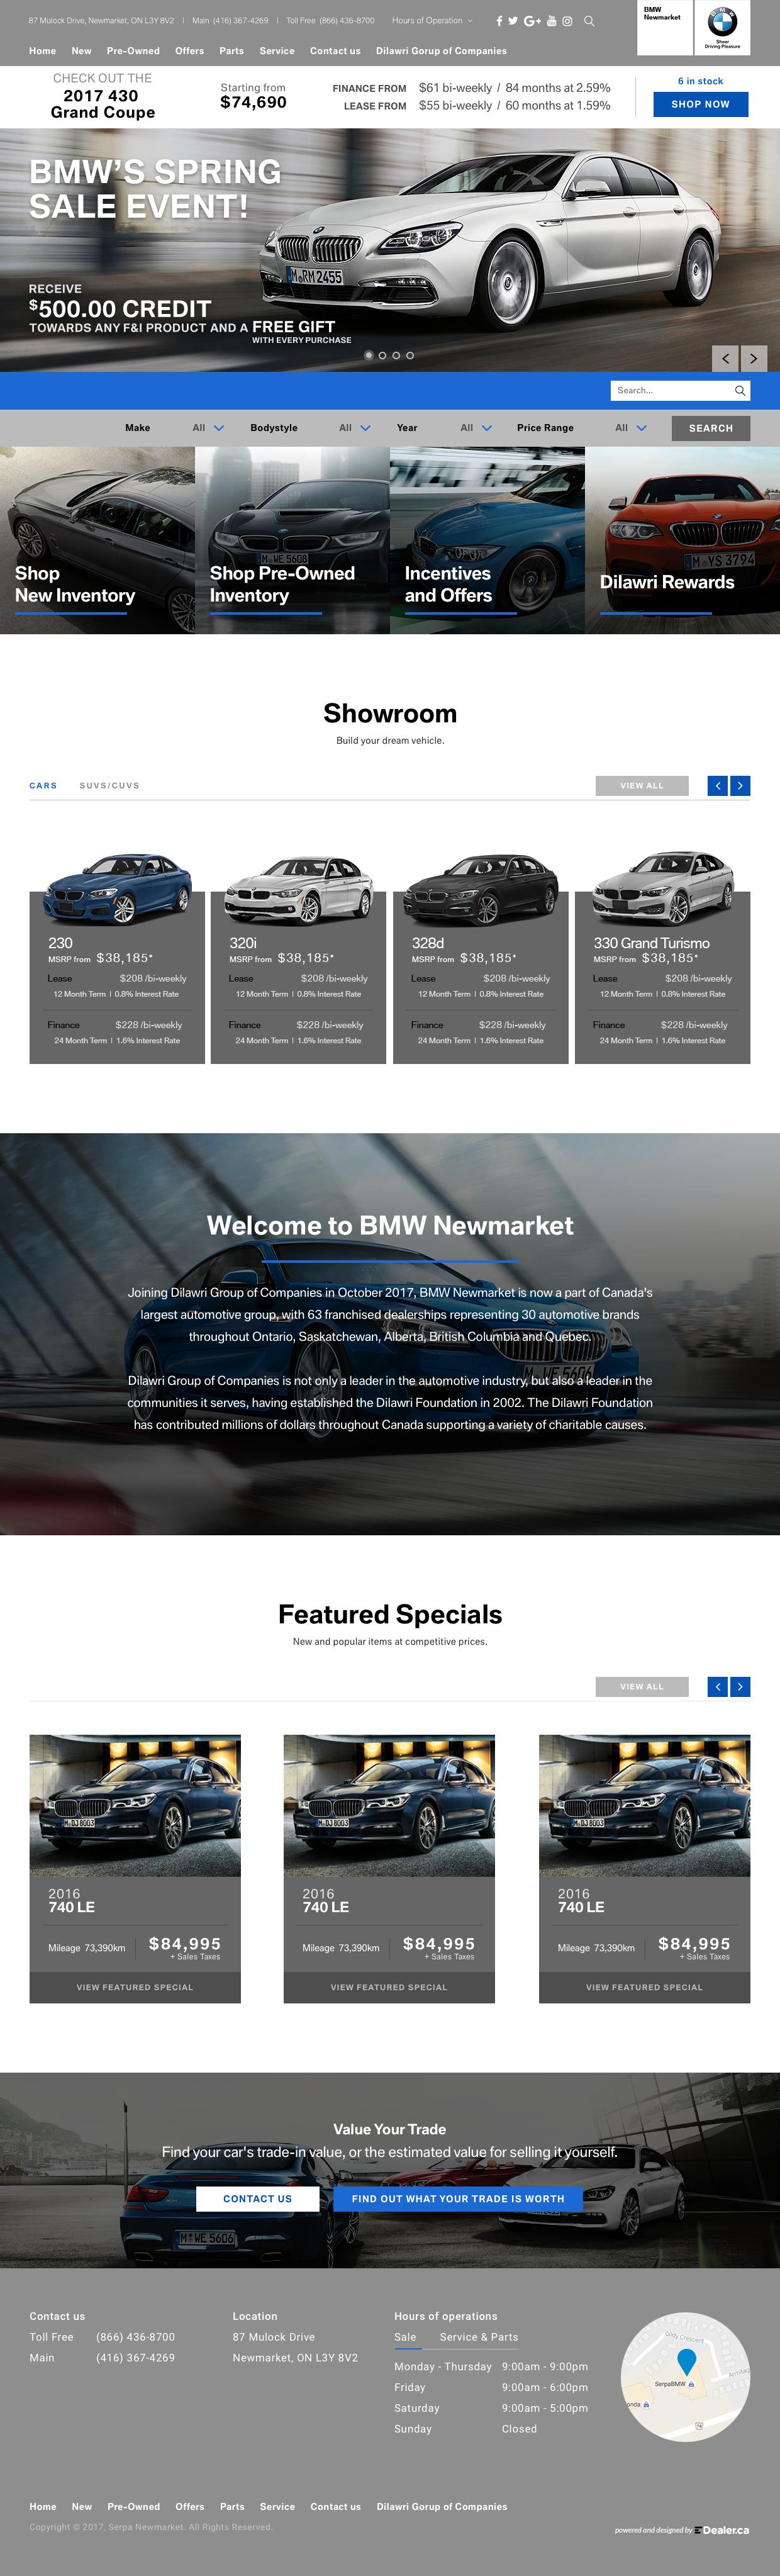 BMW Newmarket